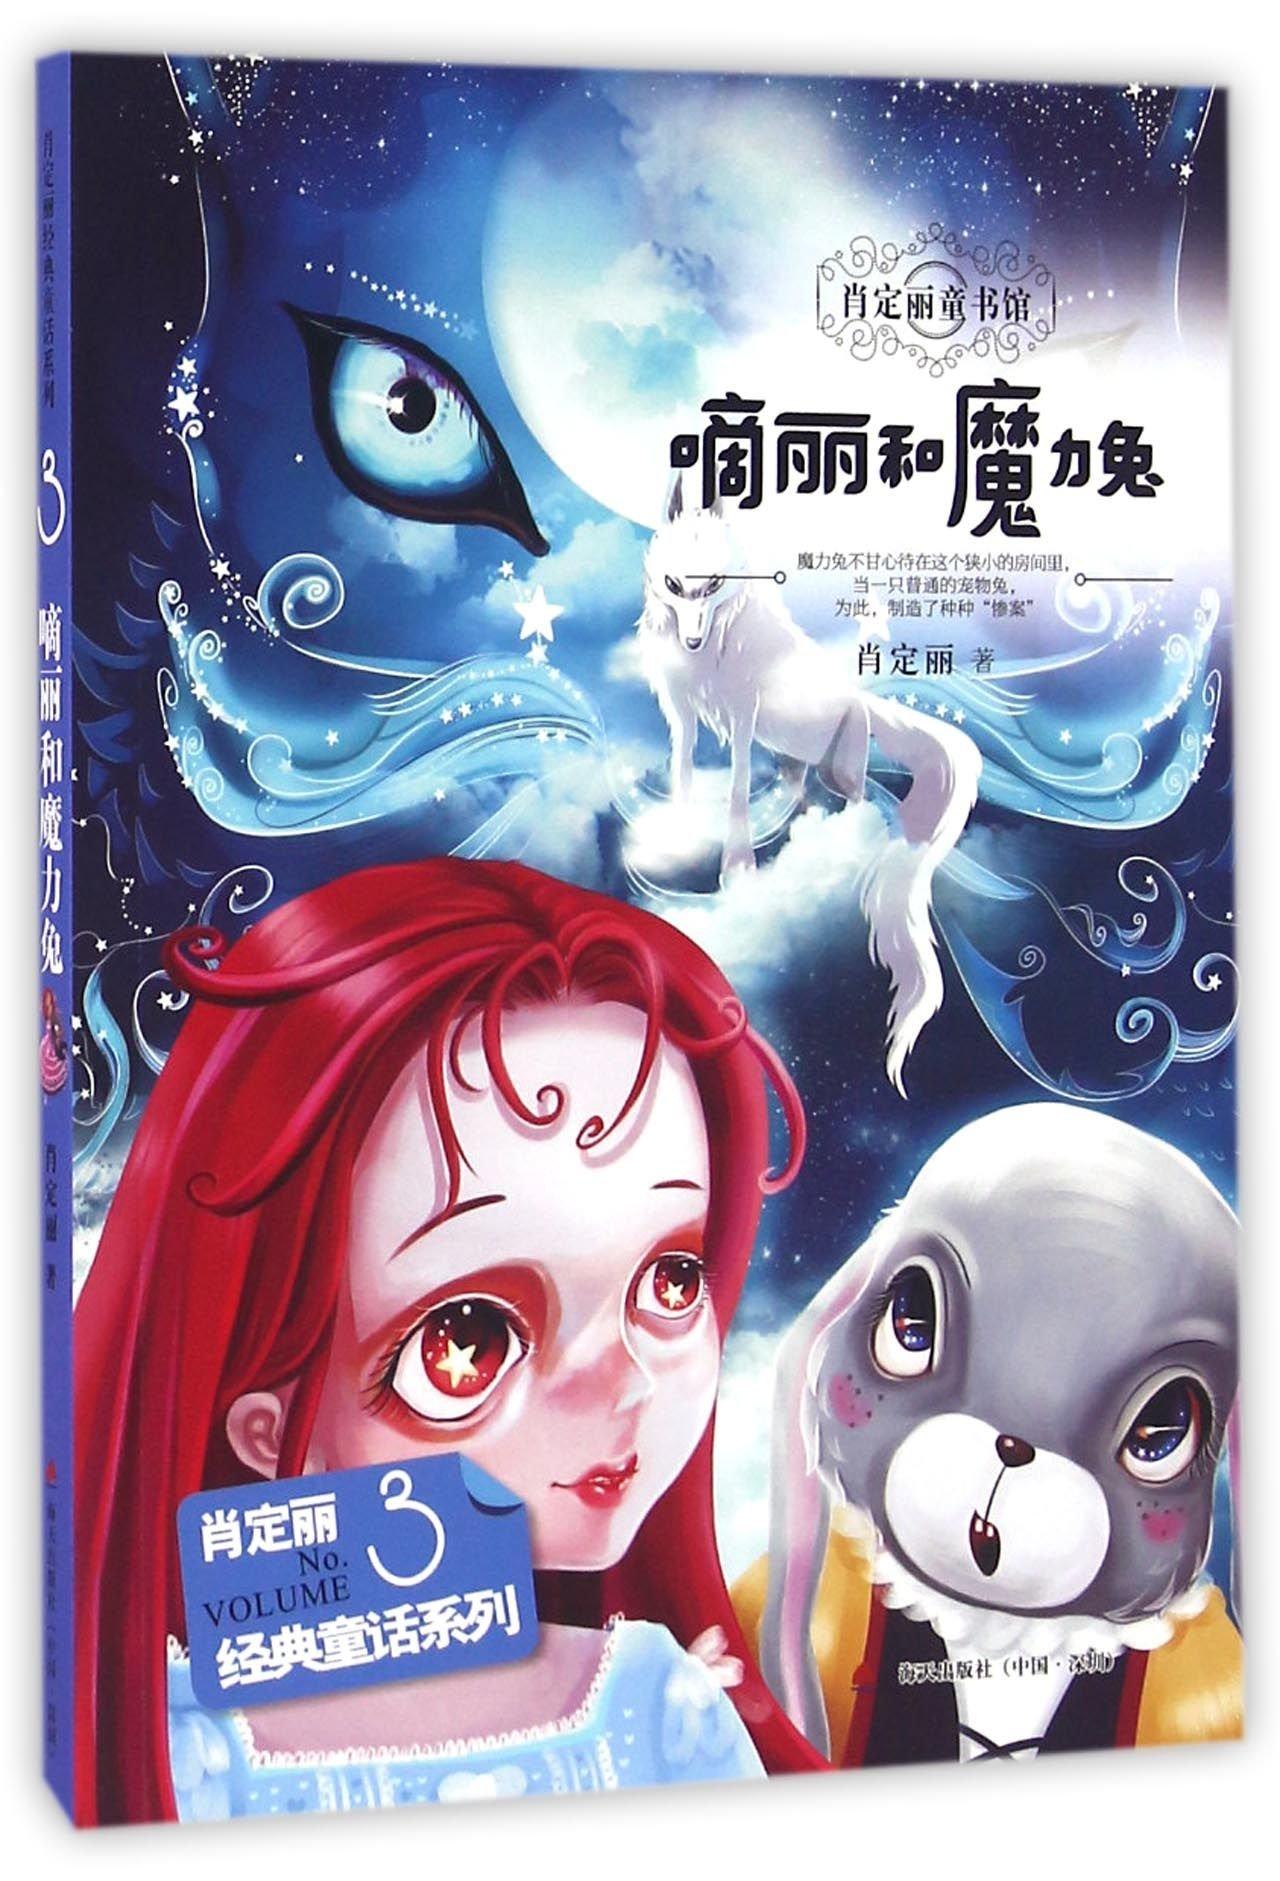 Di Li and Magic Rabbit (Chinese Edition) ebook